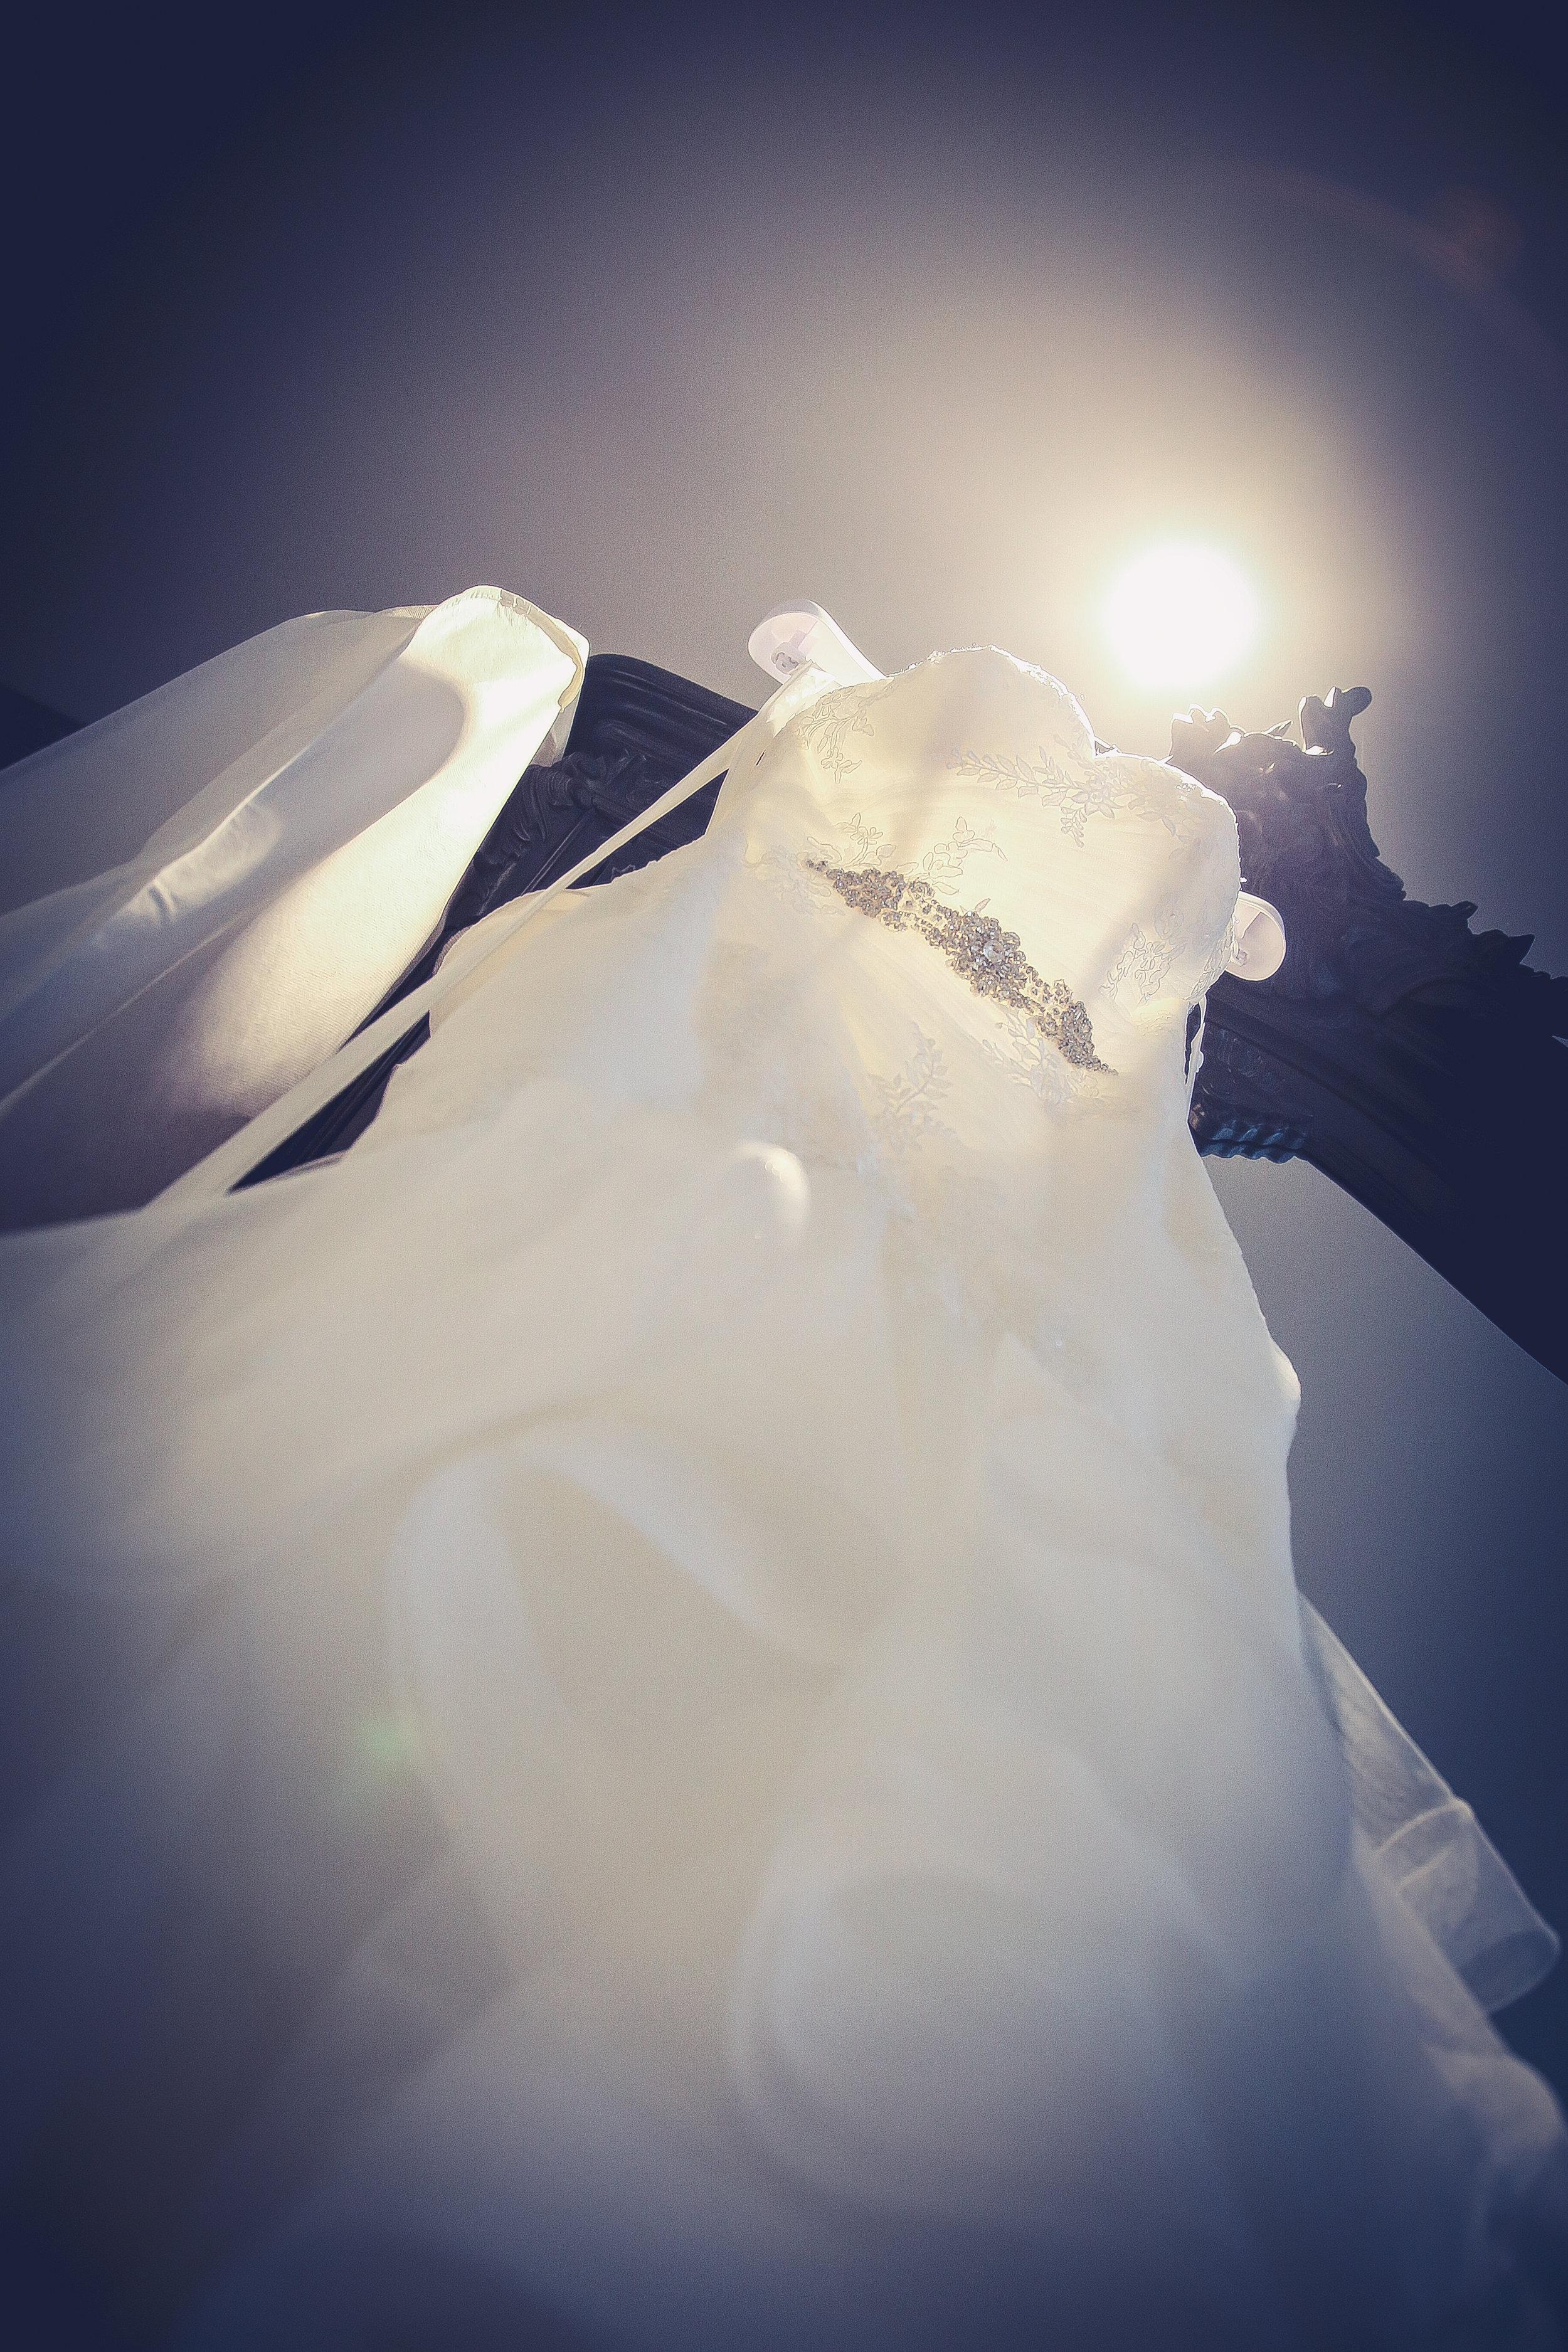 Weddings at the shankley hotel liverpool-1-6.jpg